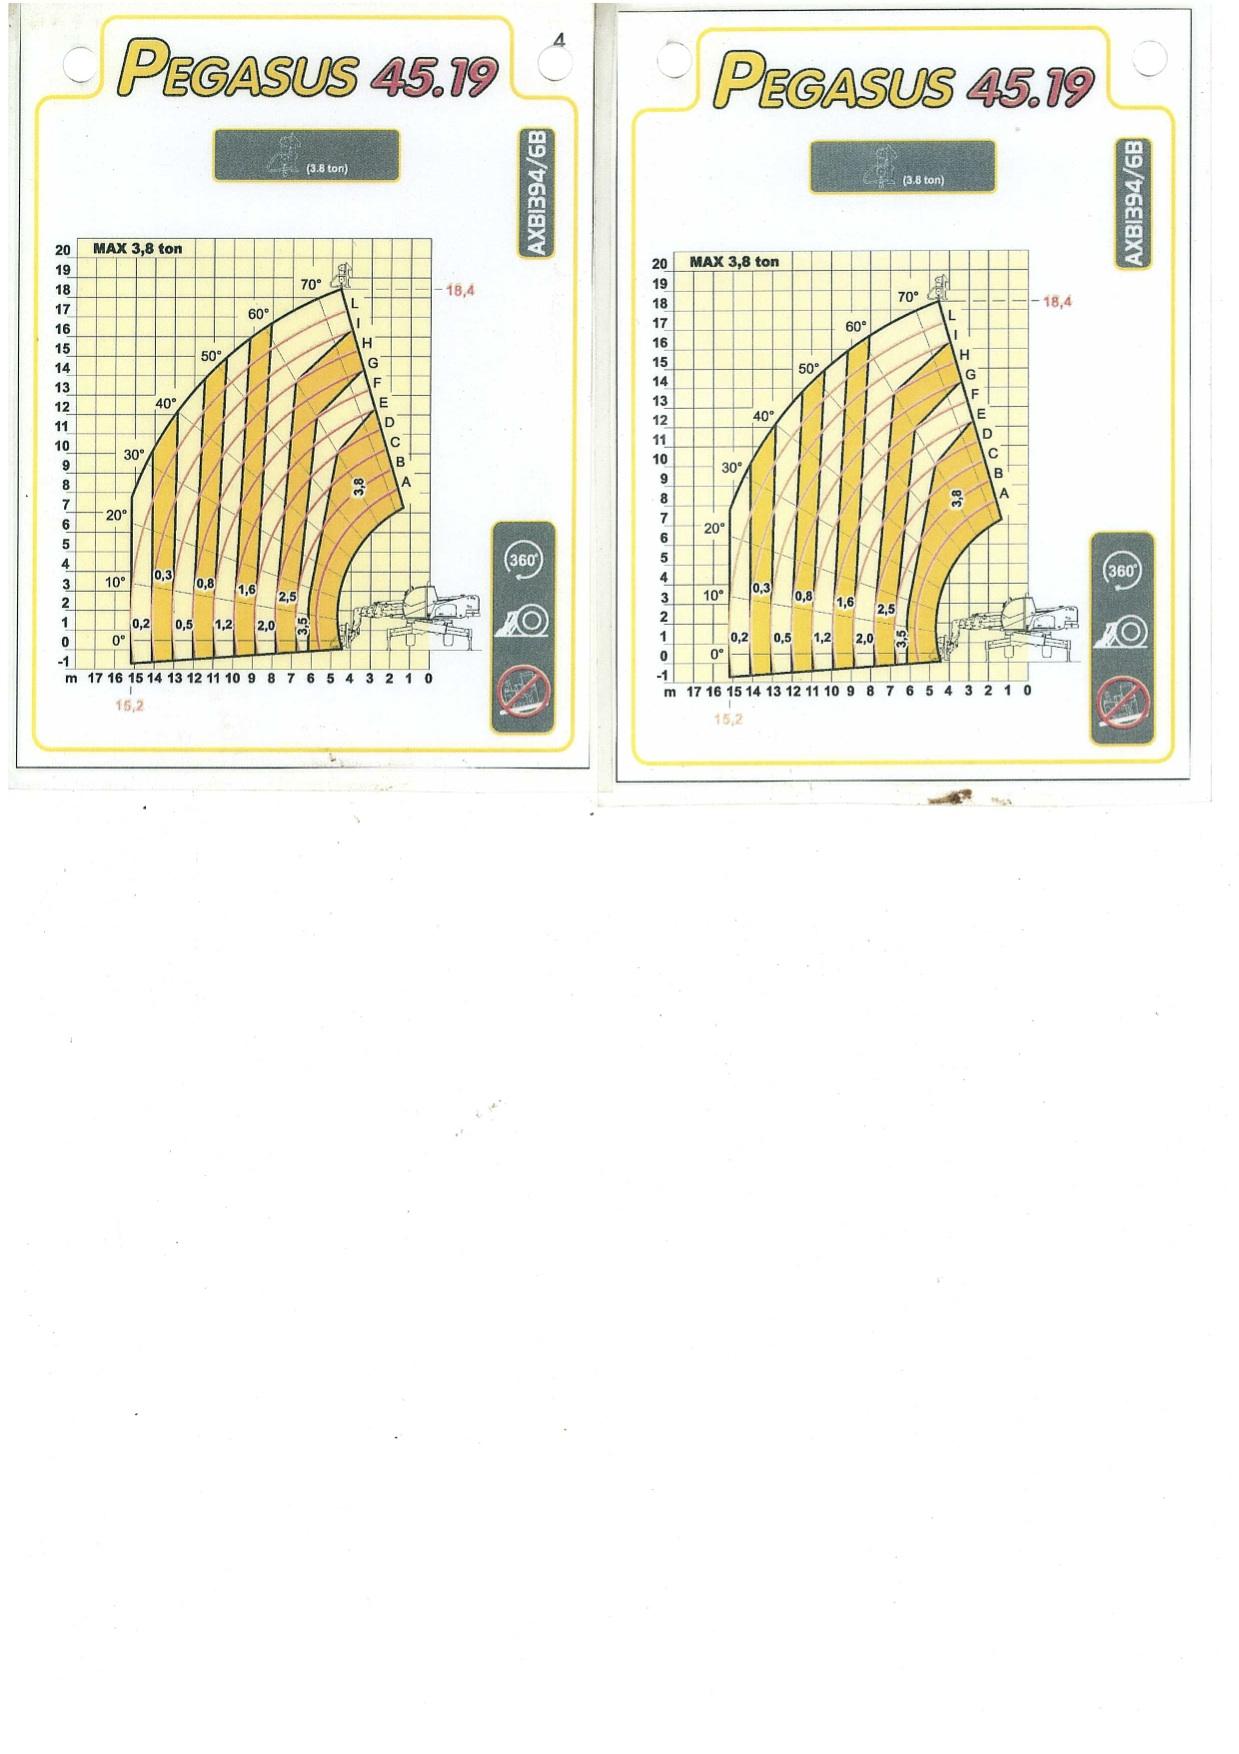 58577D-Dieci-PEGASUS-RAIL-MASTER-Telehandler-Load-Charts-9.jpg